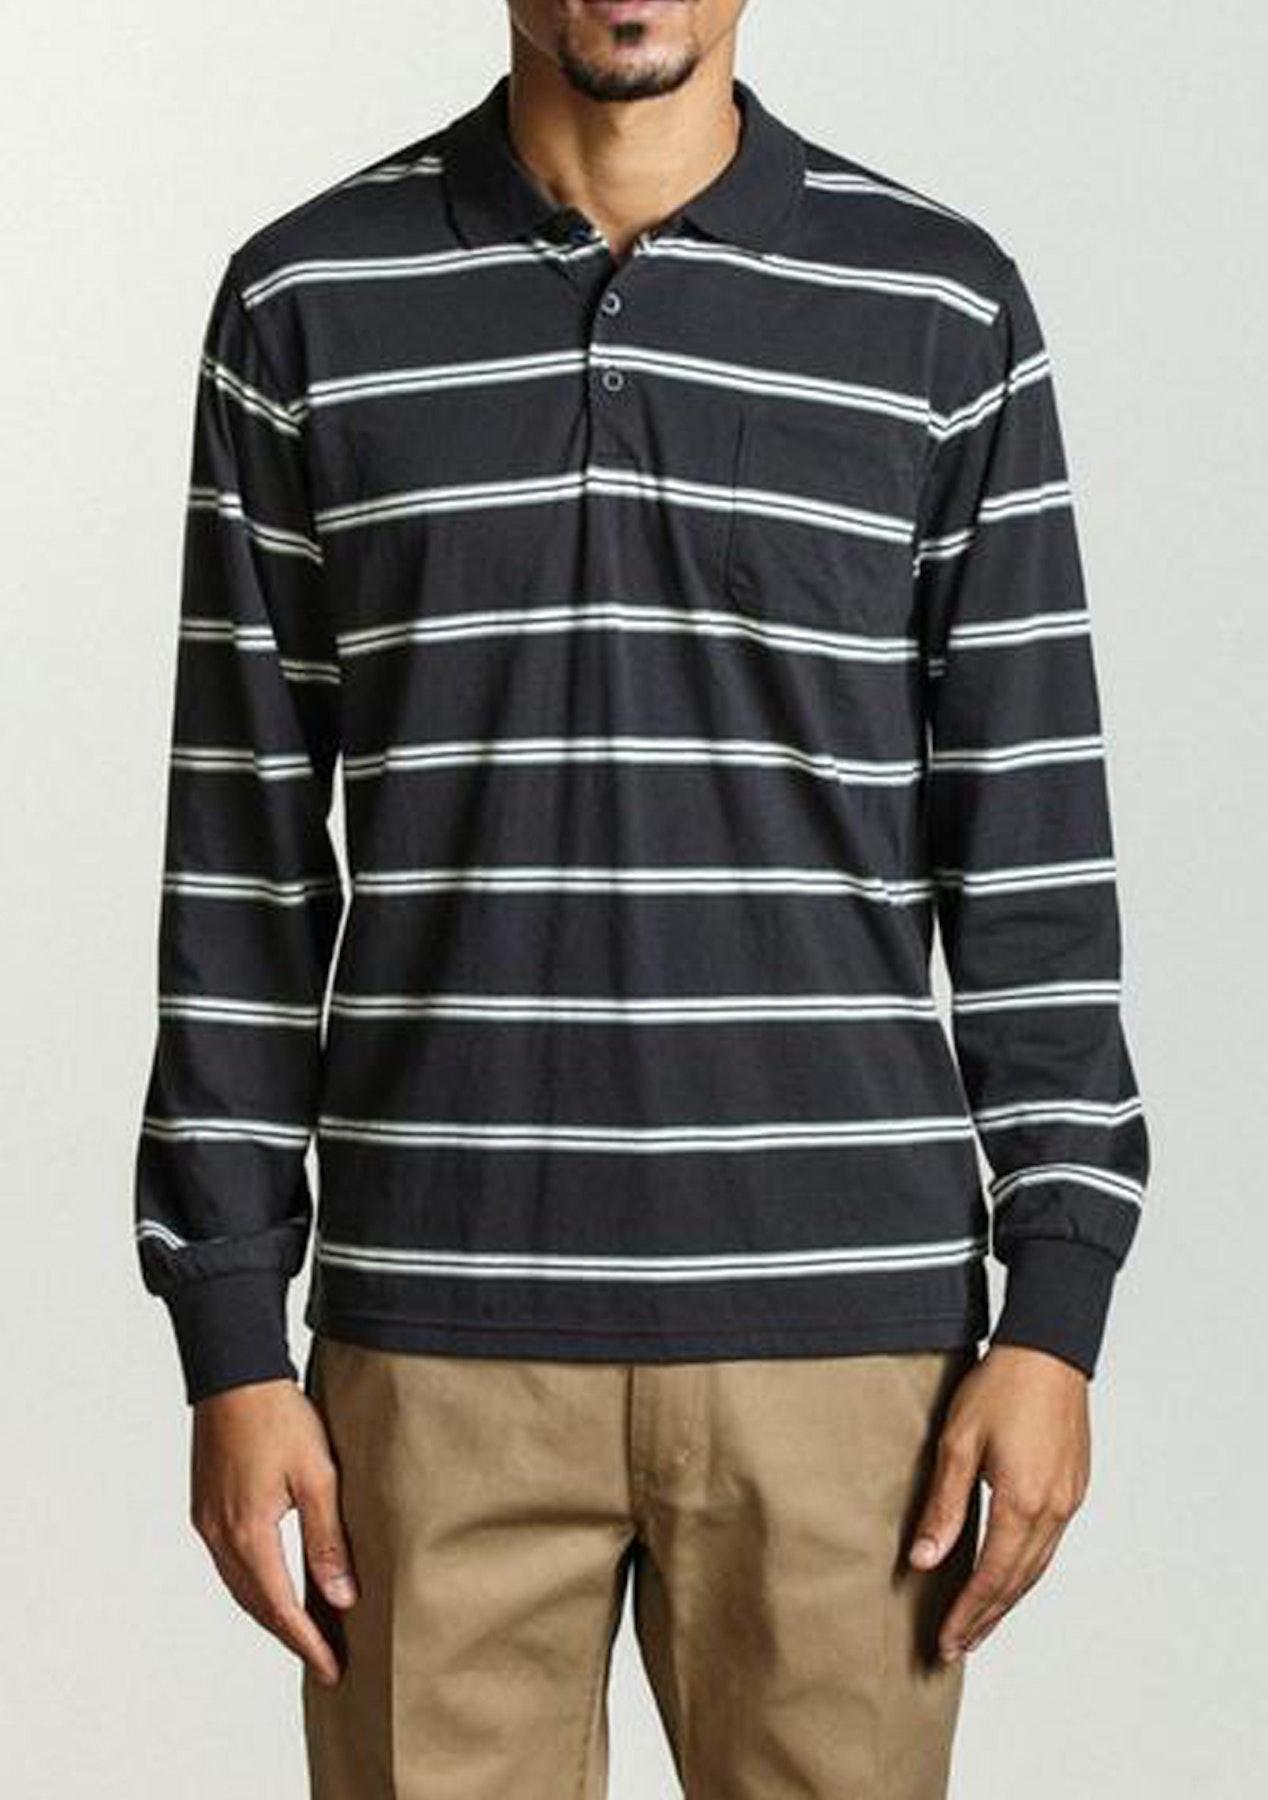 806b5b024 Brixton - Noah Longsleeve Polo Knit - Washed Black - Mens Mixed Designer  Clearance - Onceit